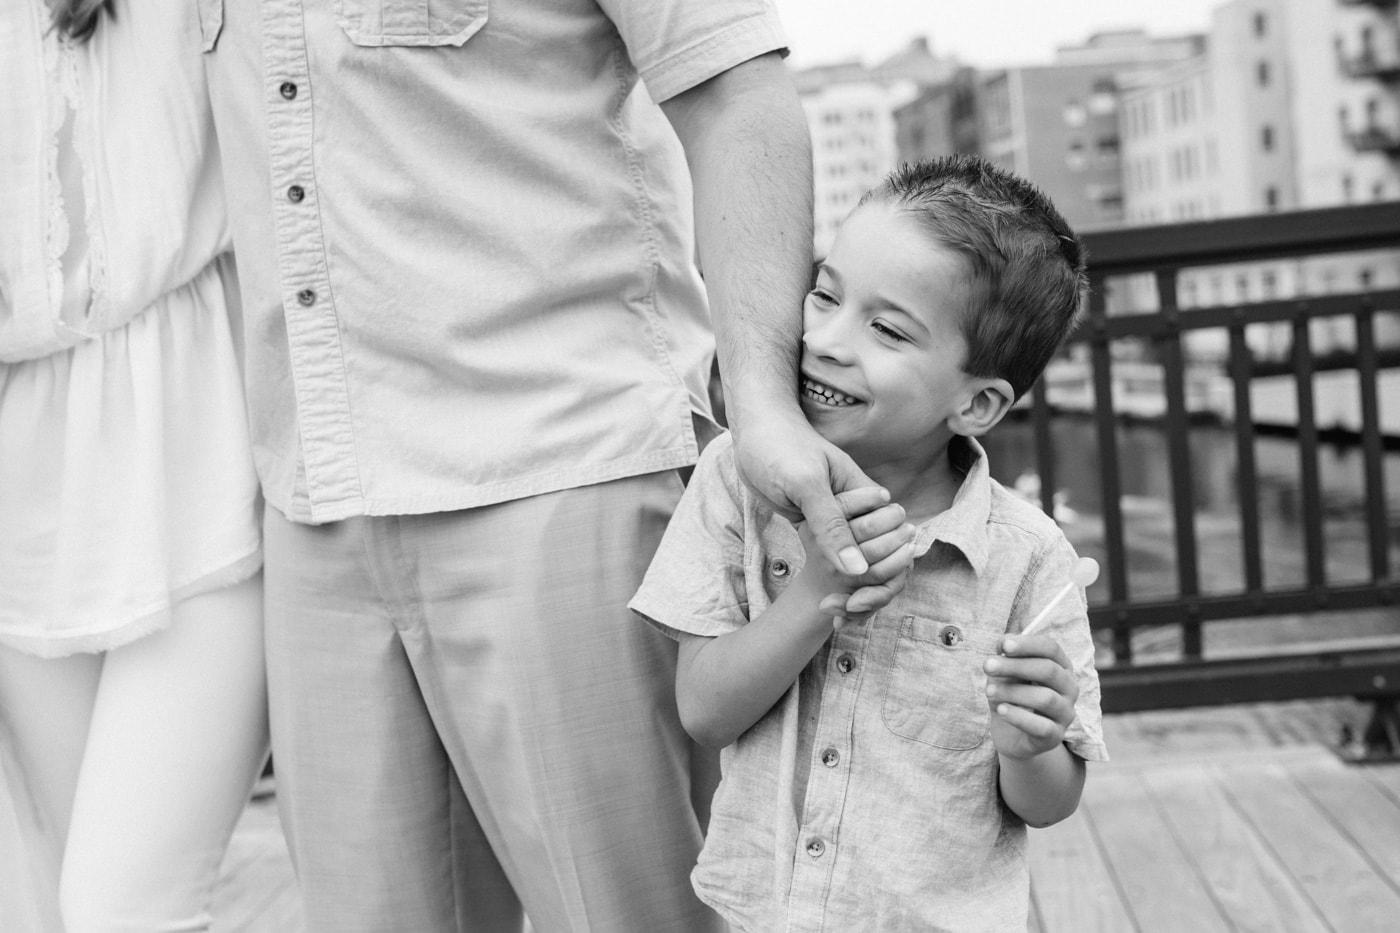 Family Session - Lifestyle Photography - Milwaukee, Wi - Double You Photography - Kat Wegrzyniak